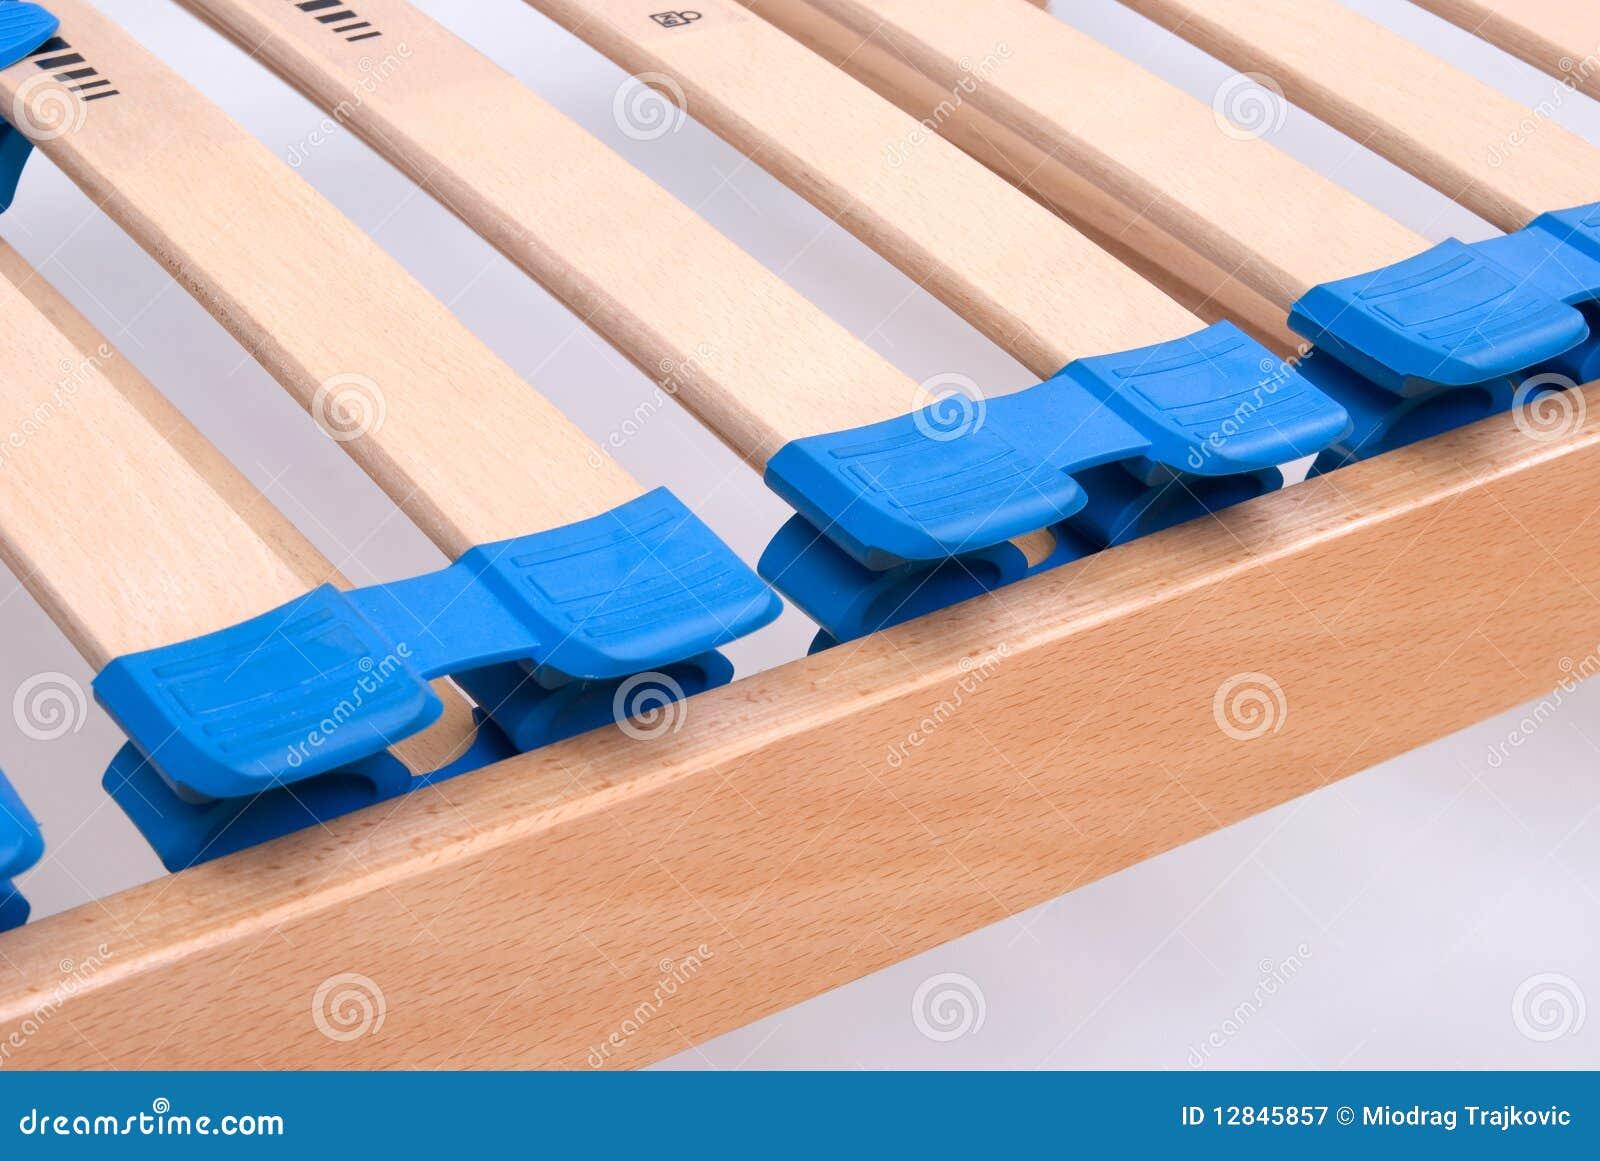 Latoflex abedul listones de madera - Madera de abedul ...